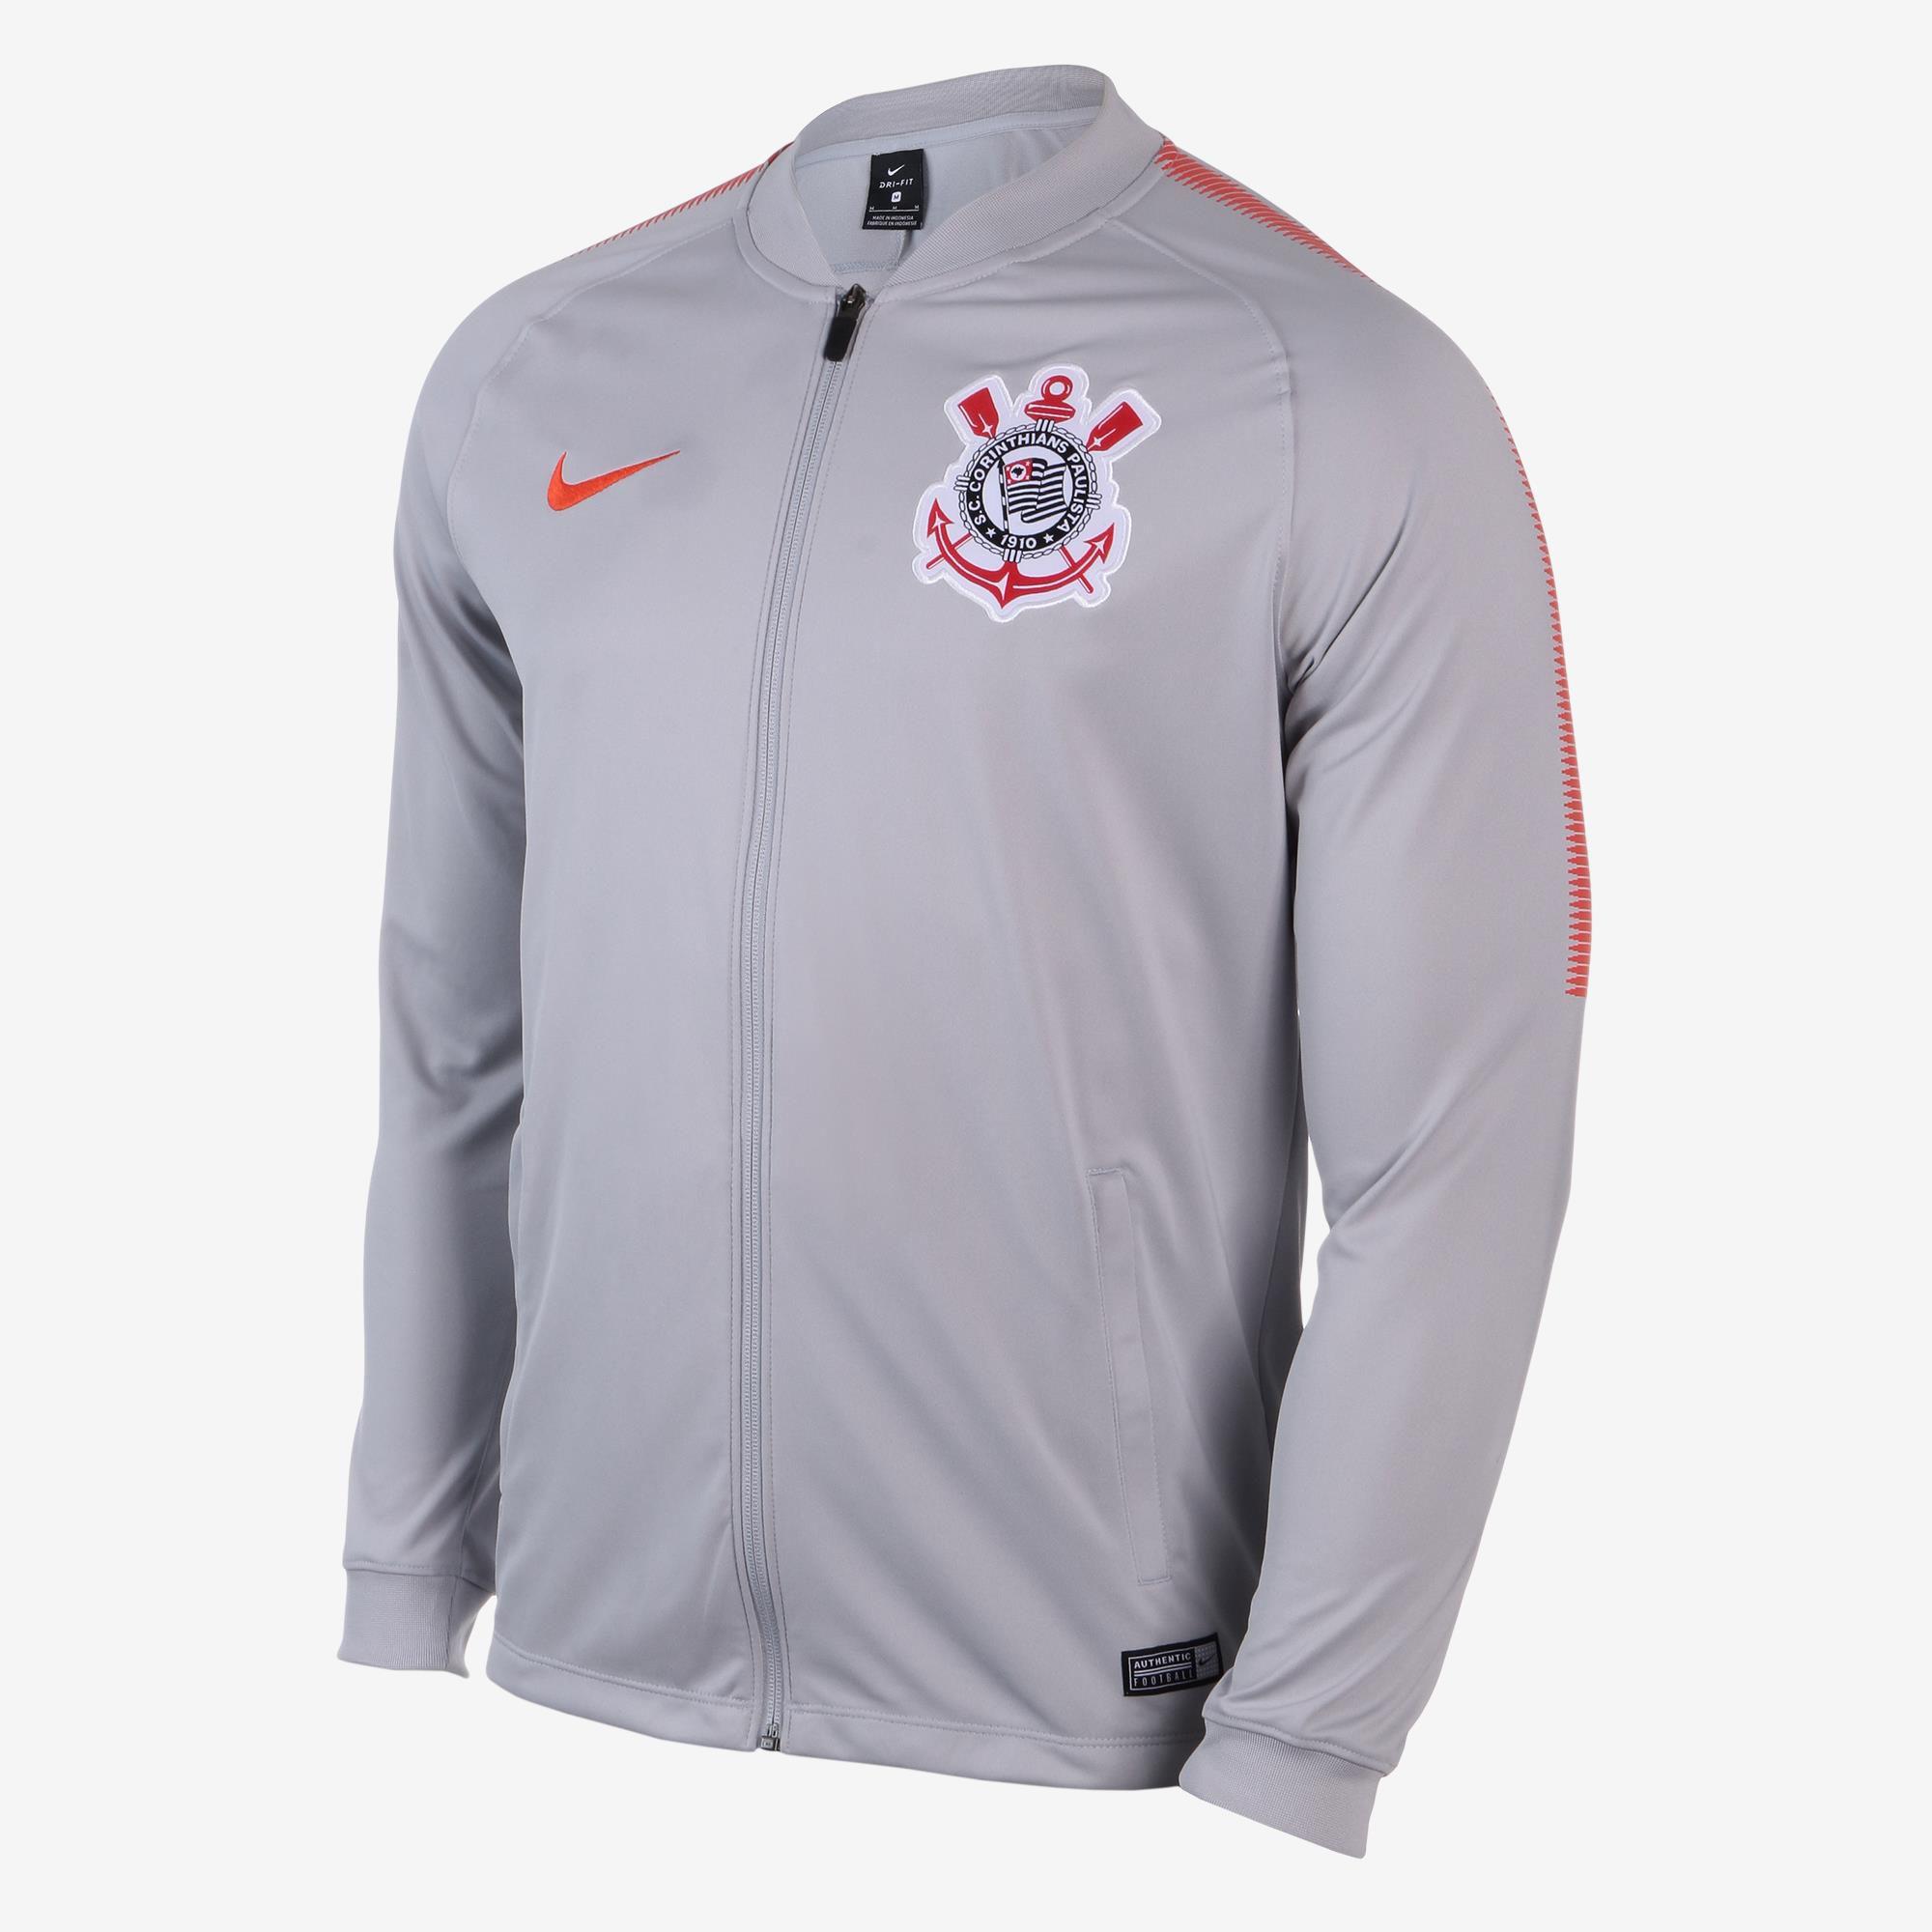 Jaqueta Corinthians Treino Nike 2018/19